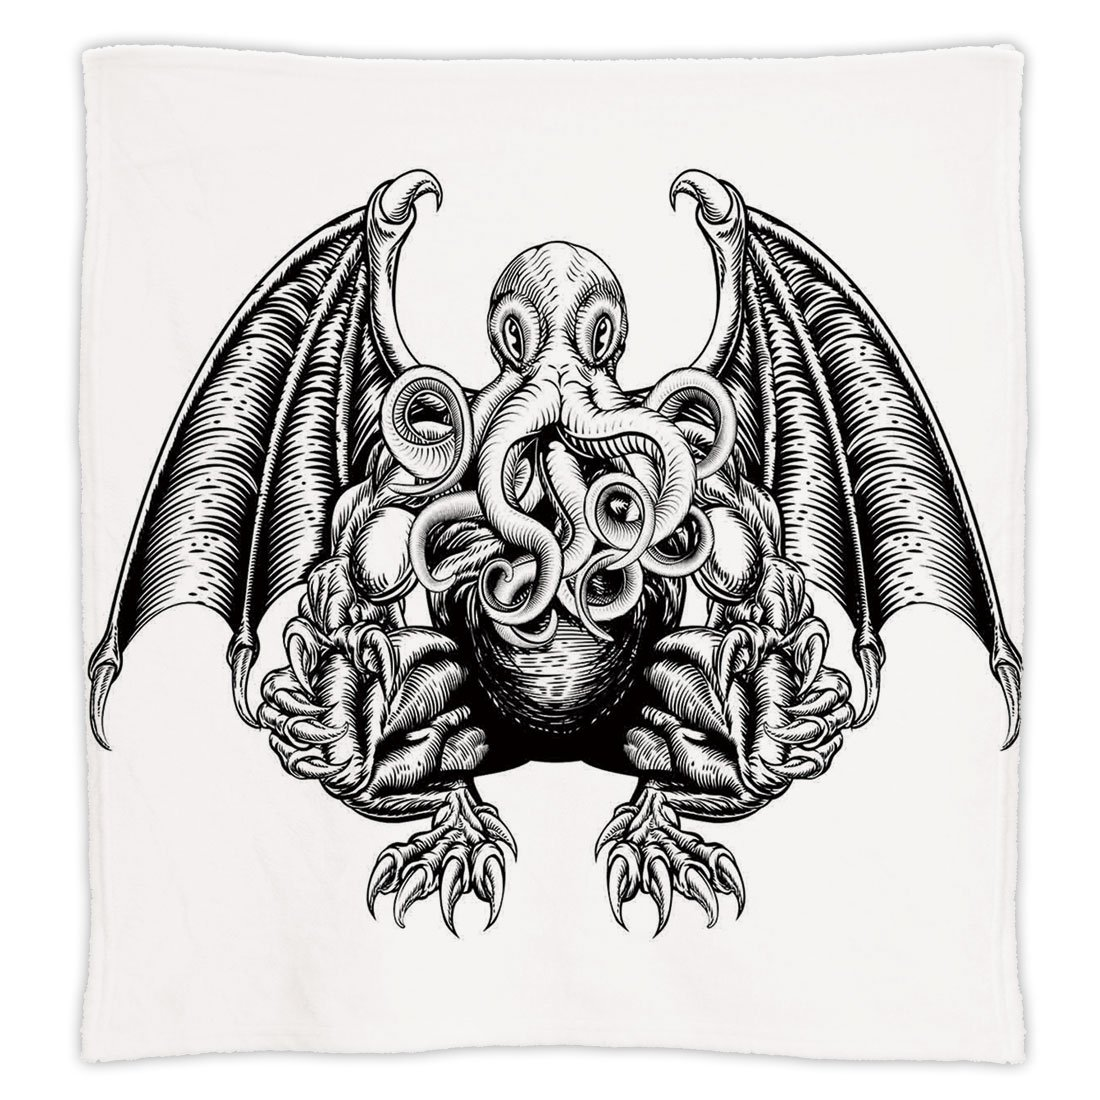 iPrint Super Soft Throw Blanket Custom Design Cozy Fleece Blanket,Kraken Decor,Cthulhu Monster Evil Fictional Cosmic Monster in Woodblock Style Illustration,Black White,Perfect for Couch Sofa or Bed